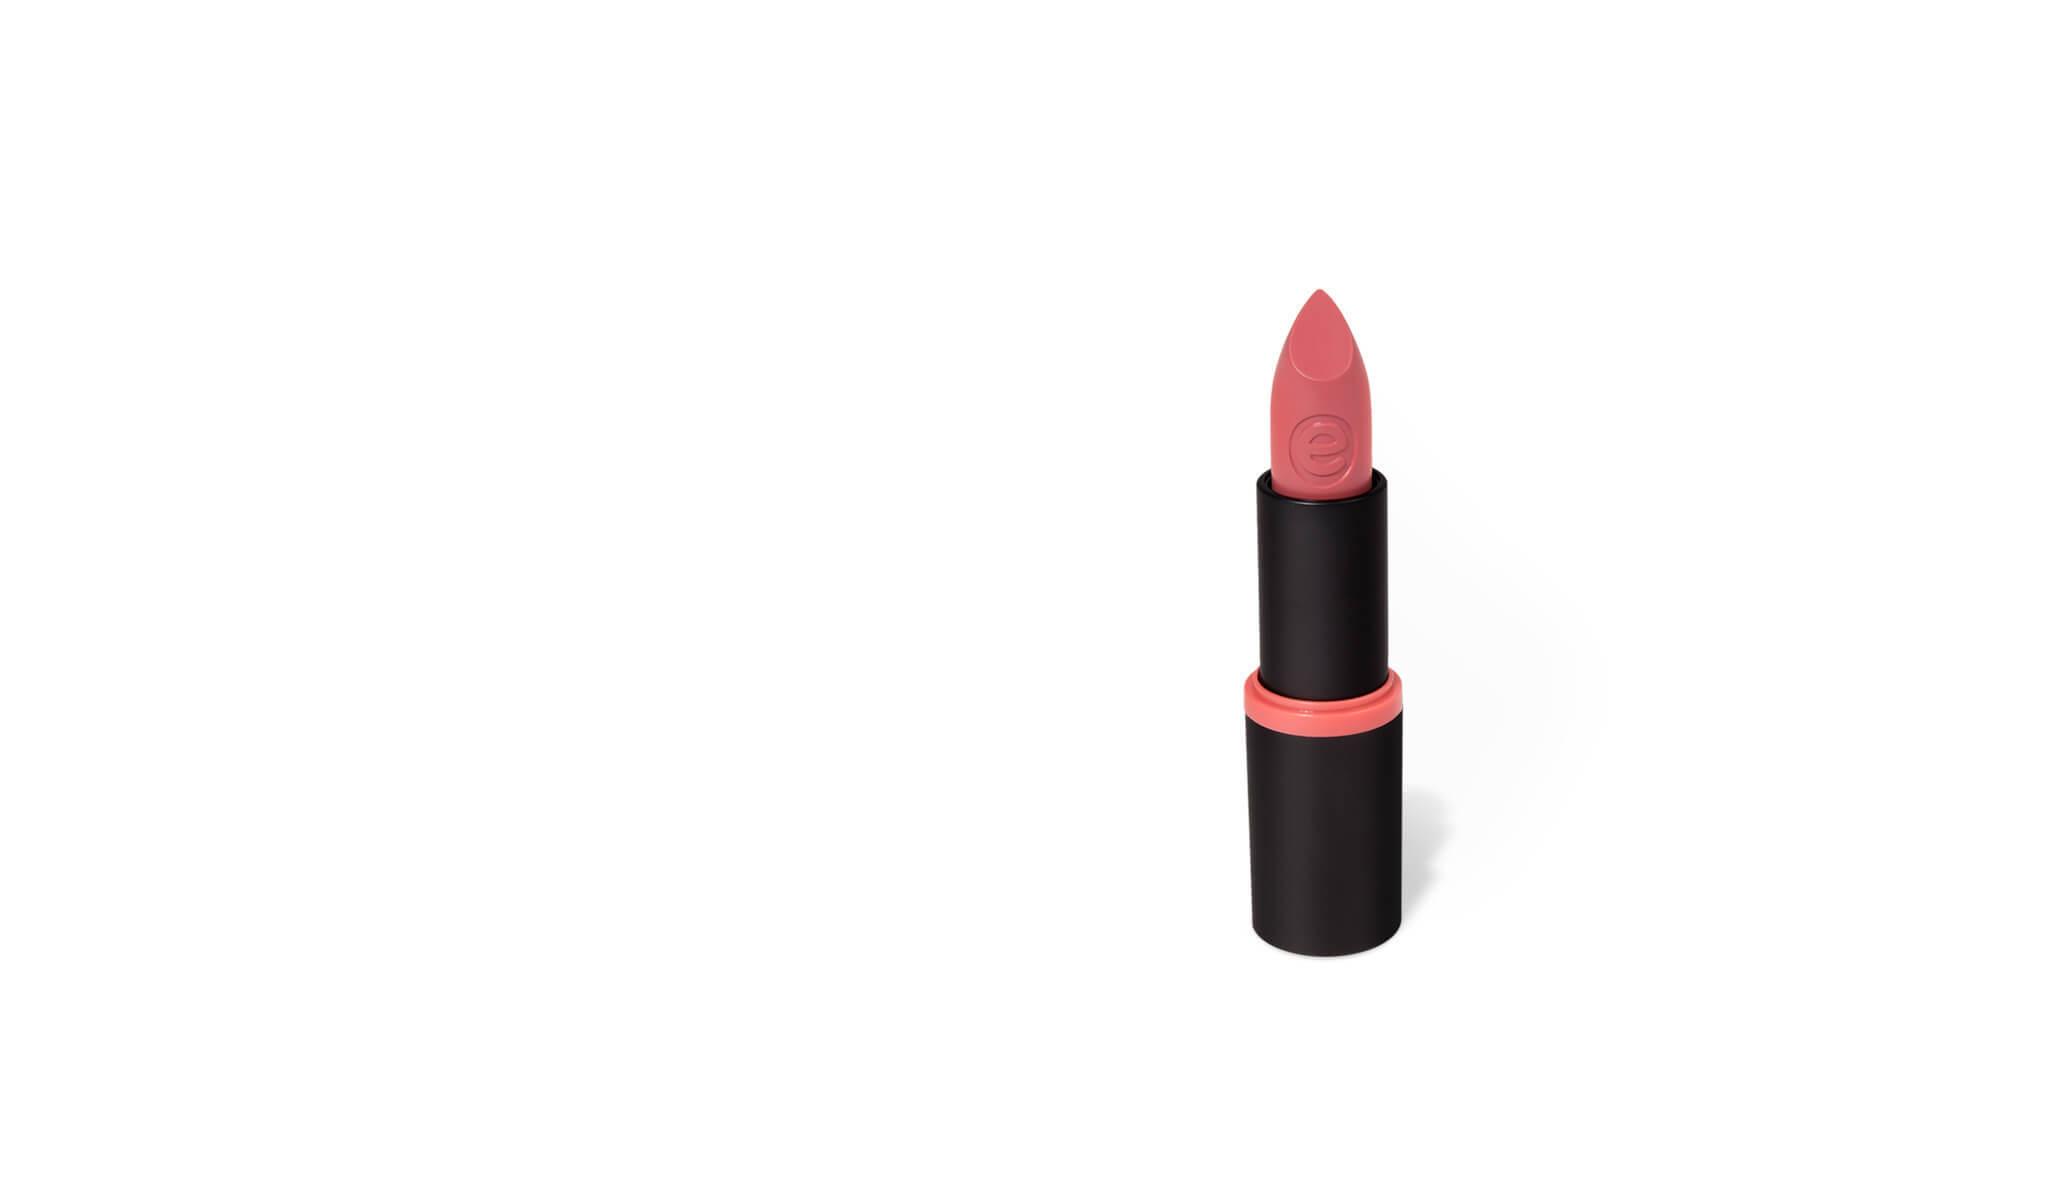 Long Lasting Exterior House Paint Colors Ideas: Essence Long Lasting Lipsticks Reviews In Lipstick